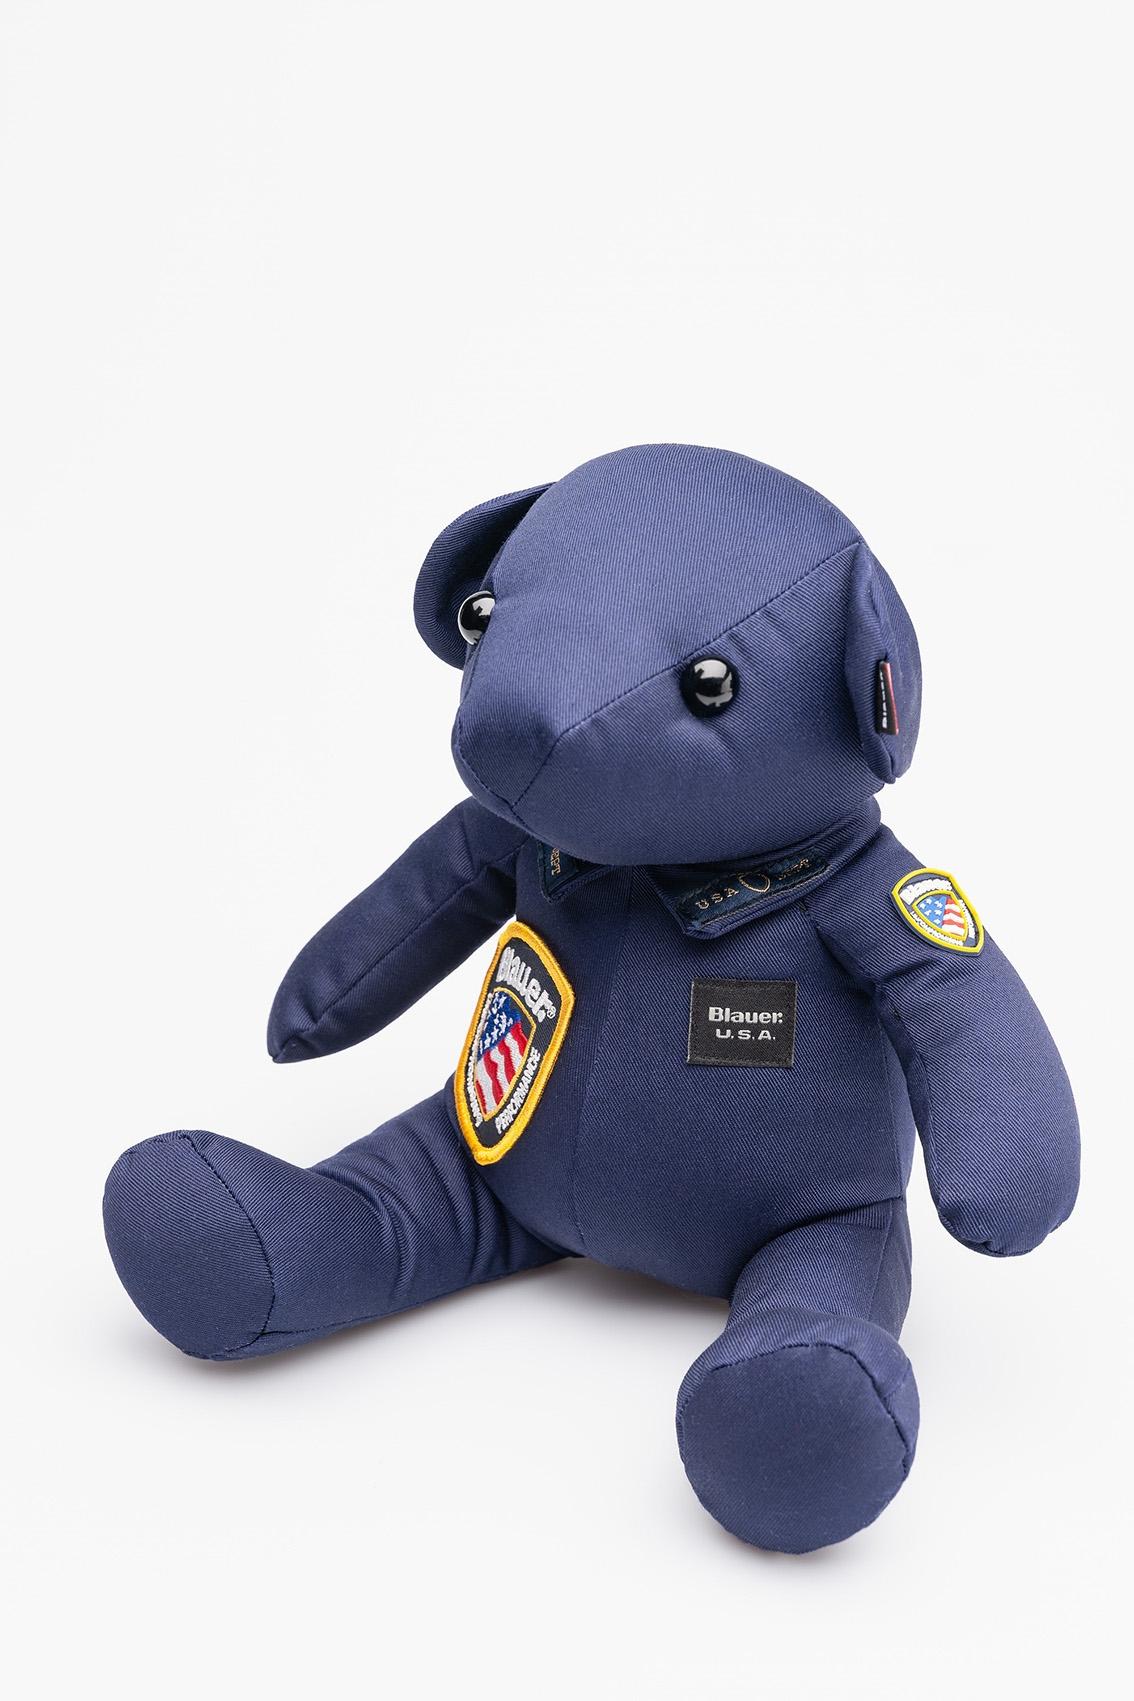 teddy-blauer-3-copia